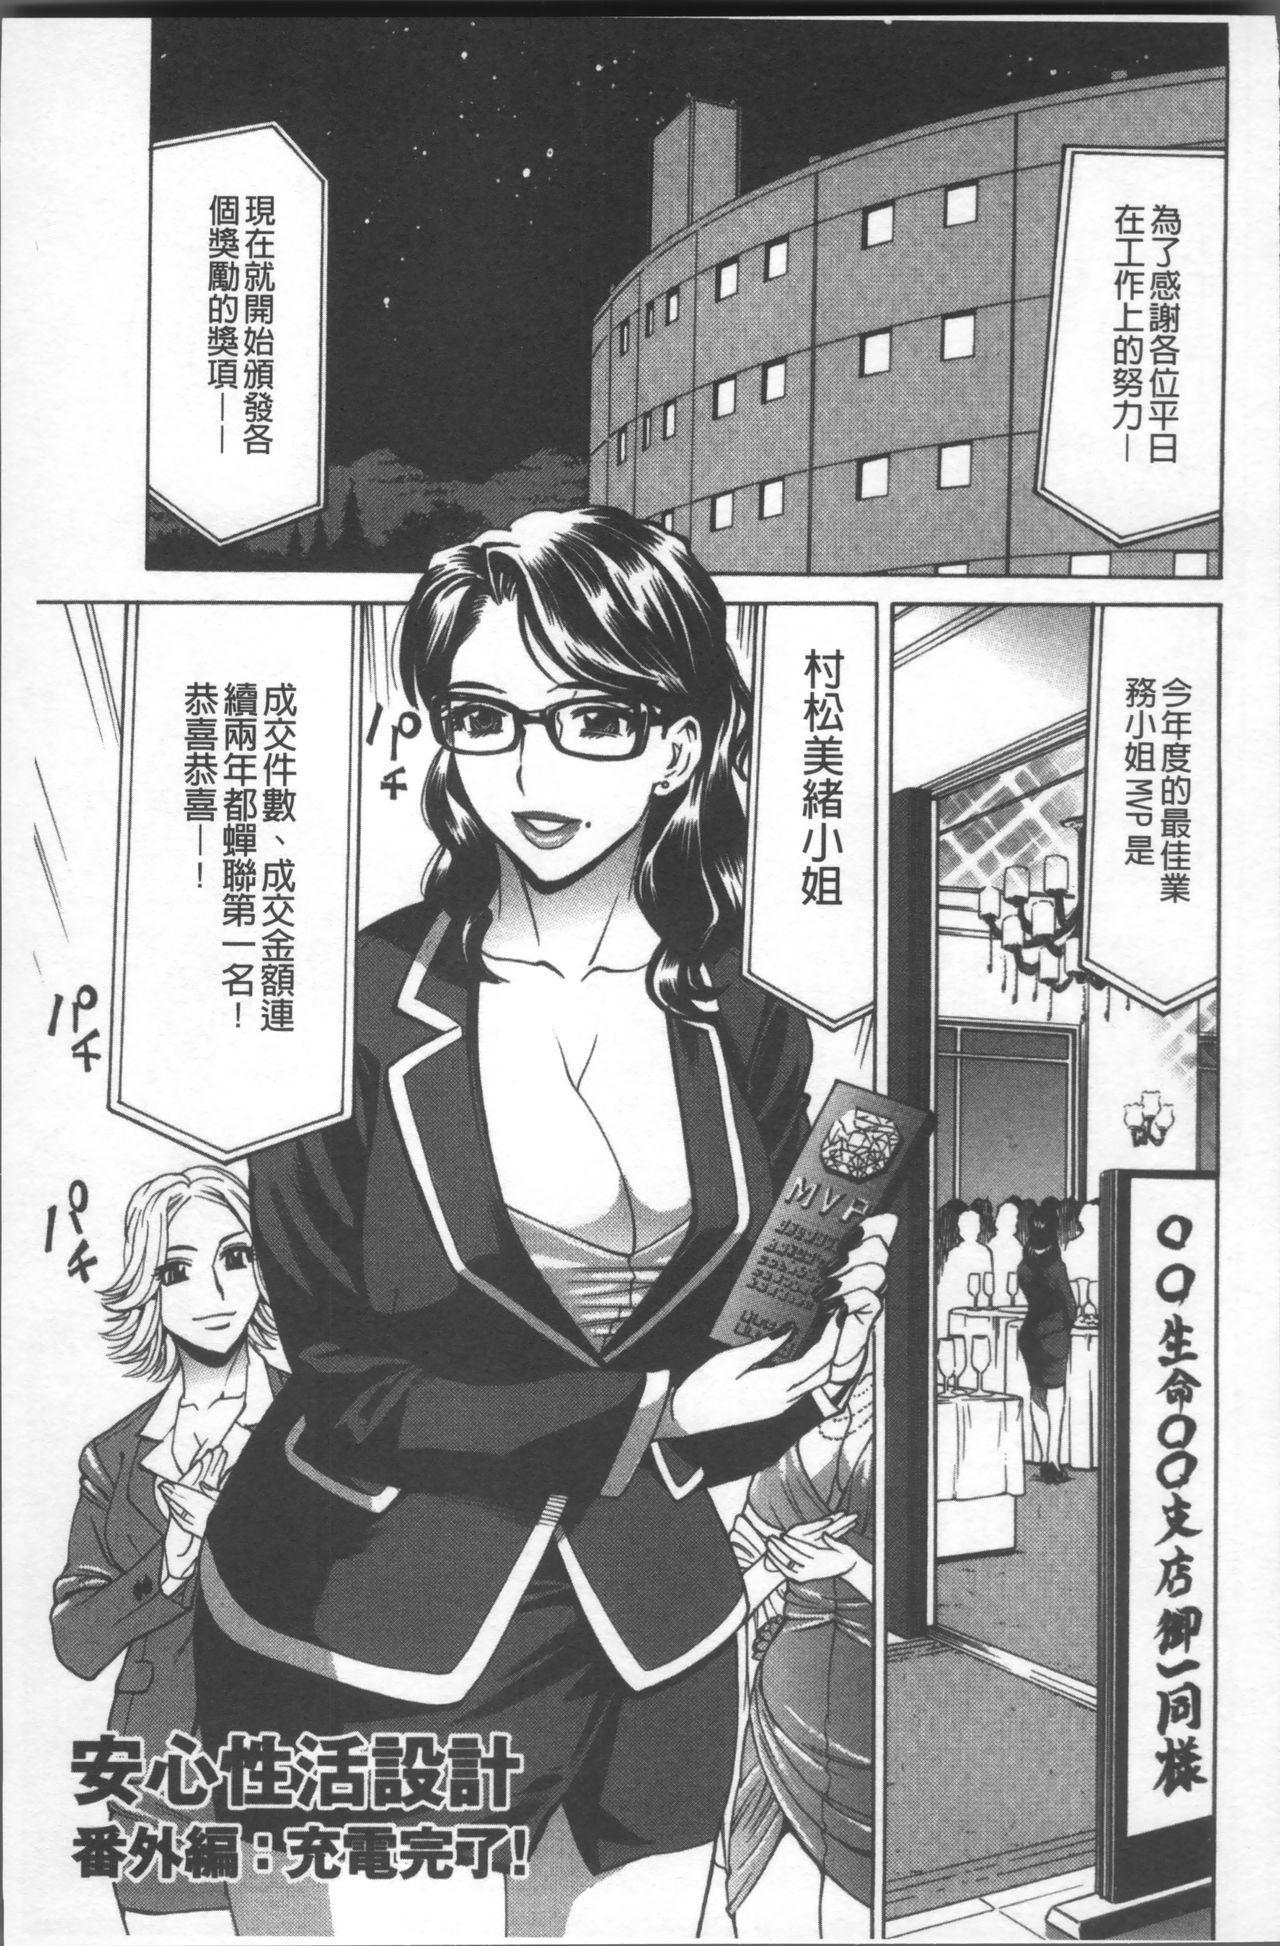 Hitozuma Kanshasai - SUPER EROTIC WIFE'S FESTIVAL 140